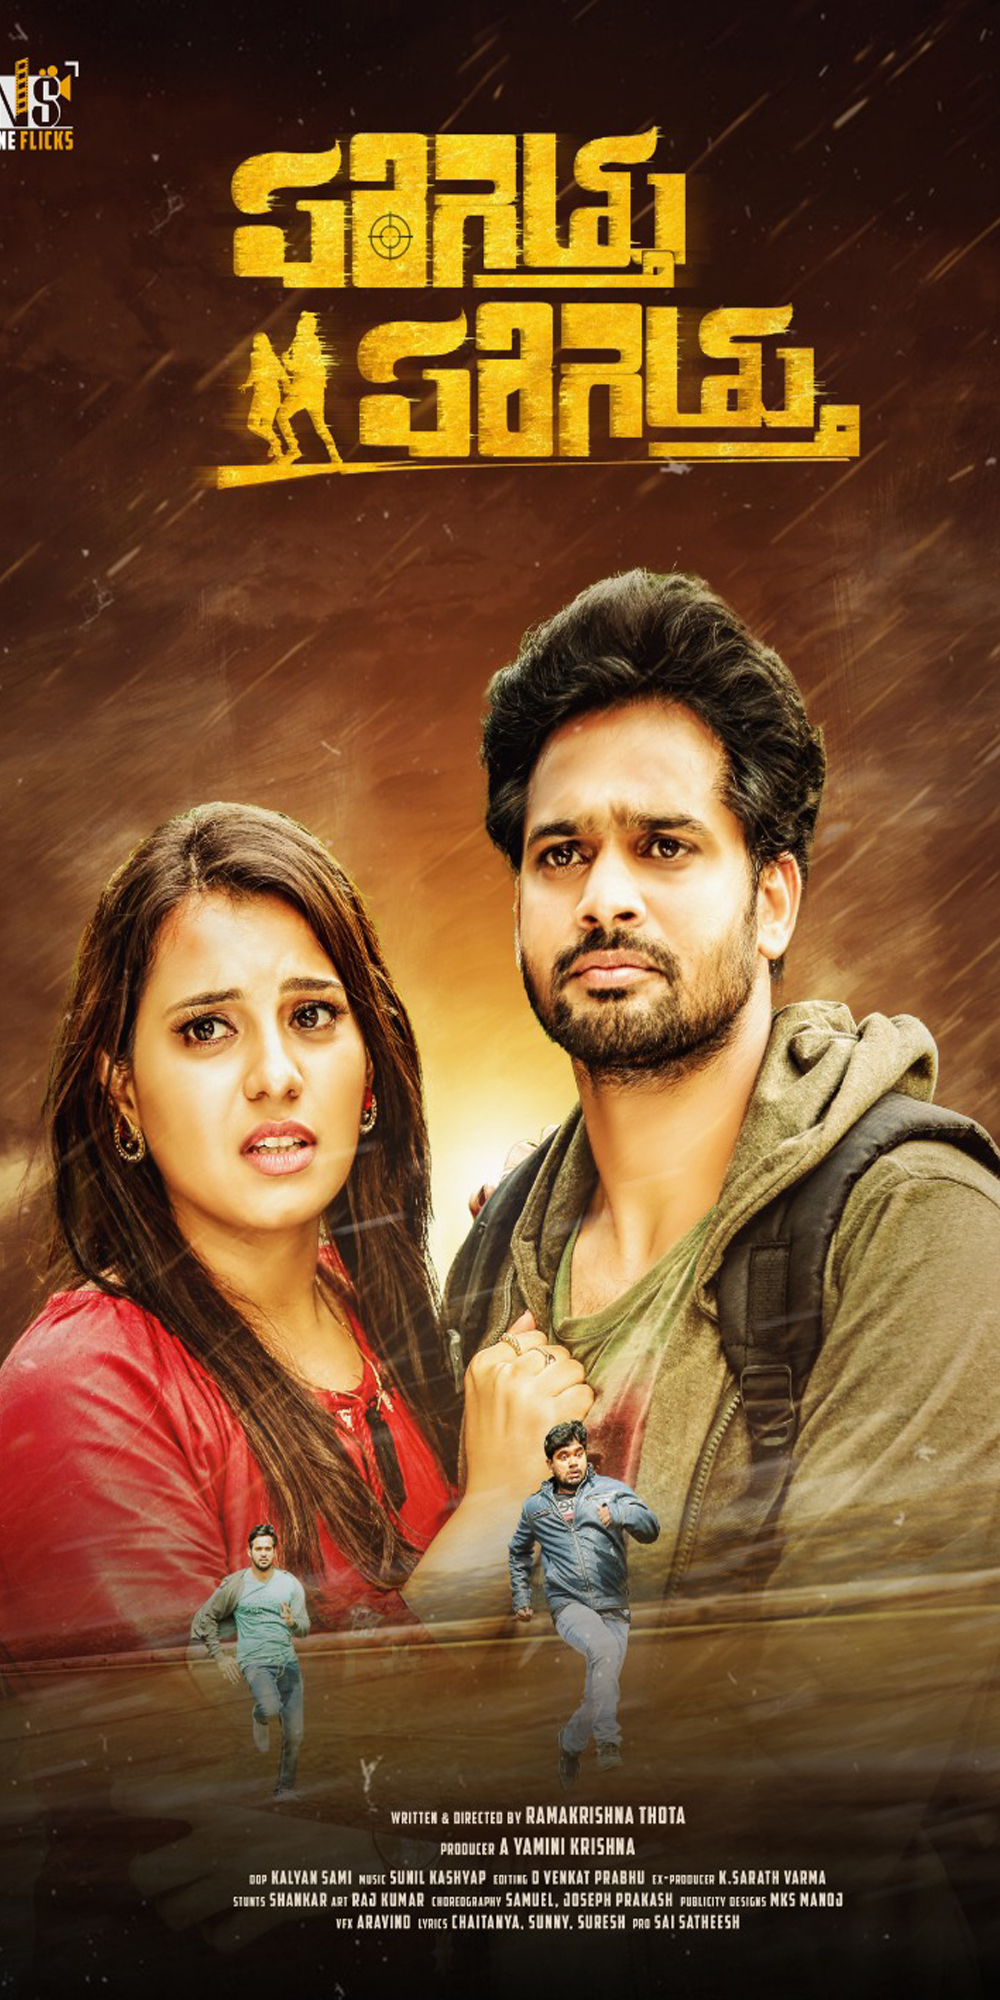 Parigettu Parigettu 2021 Telugu Movie 480p 720p WEB-DL ESub